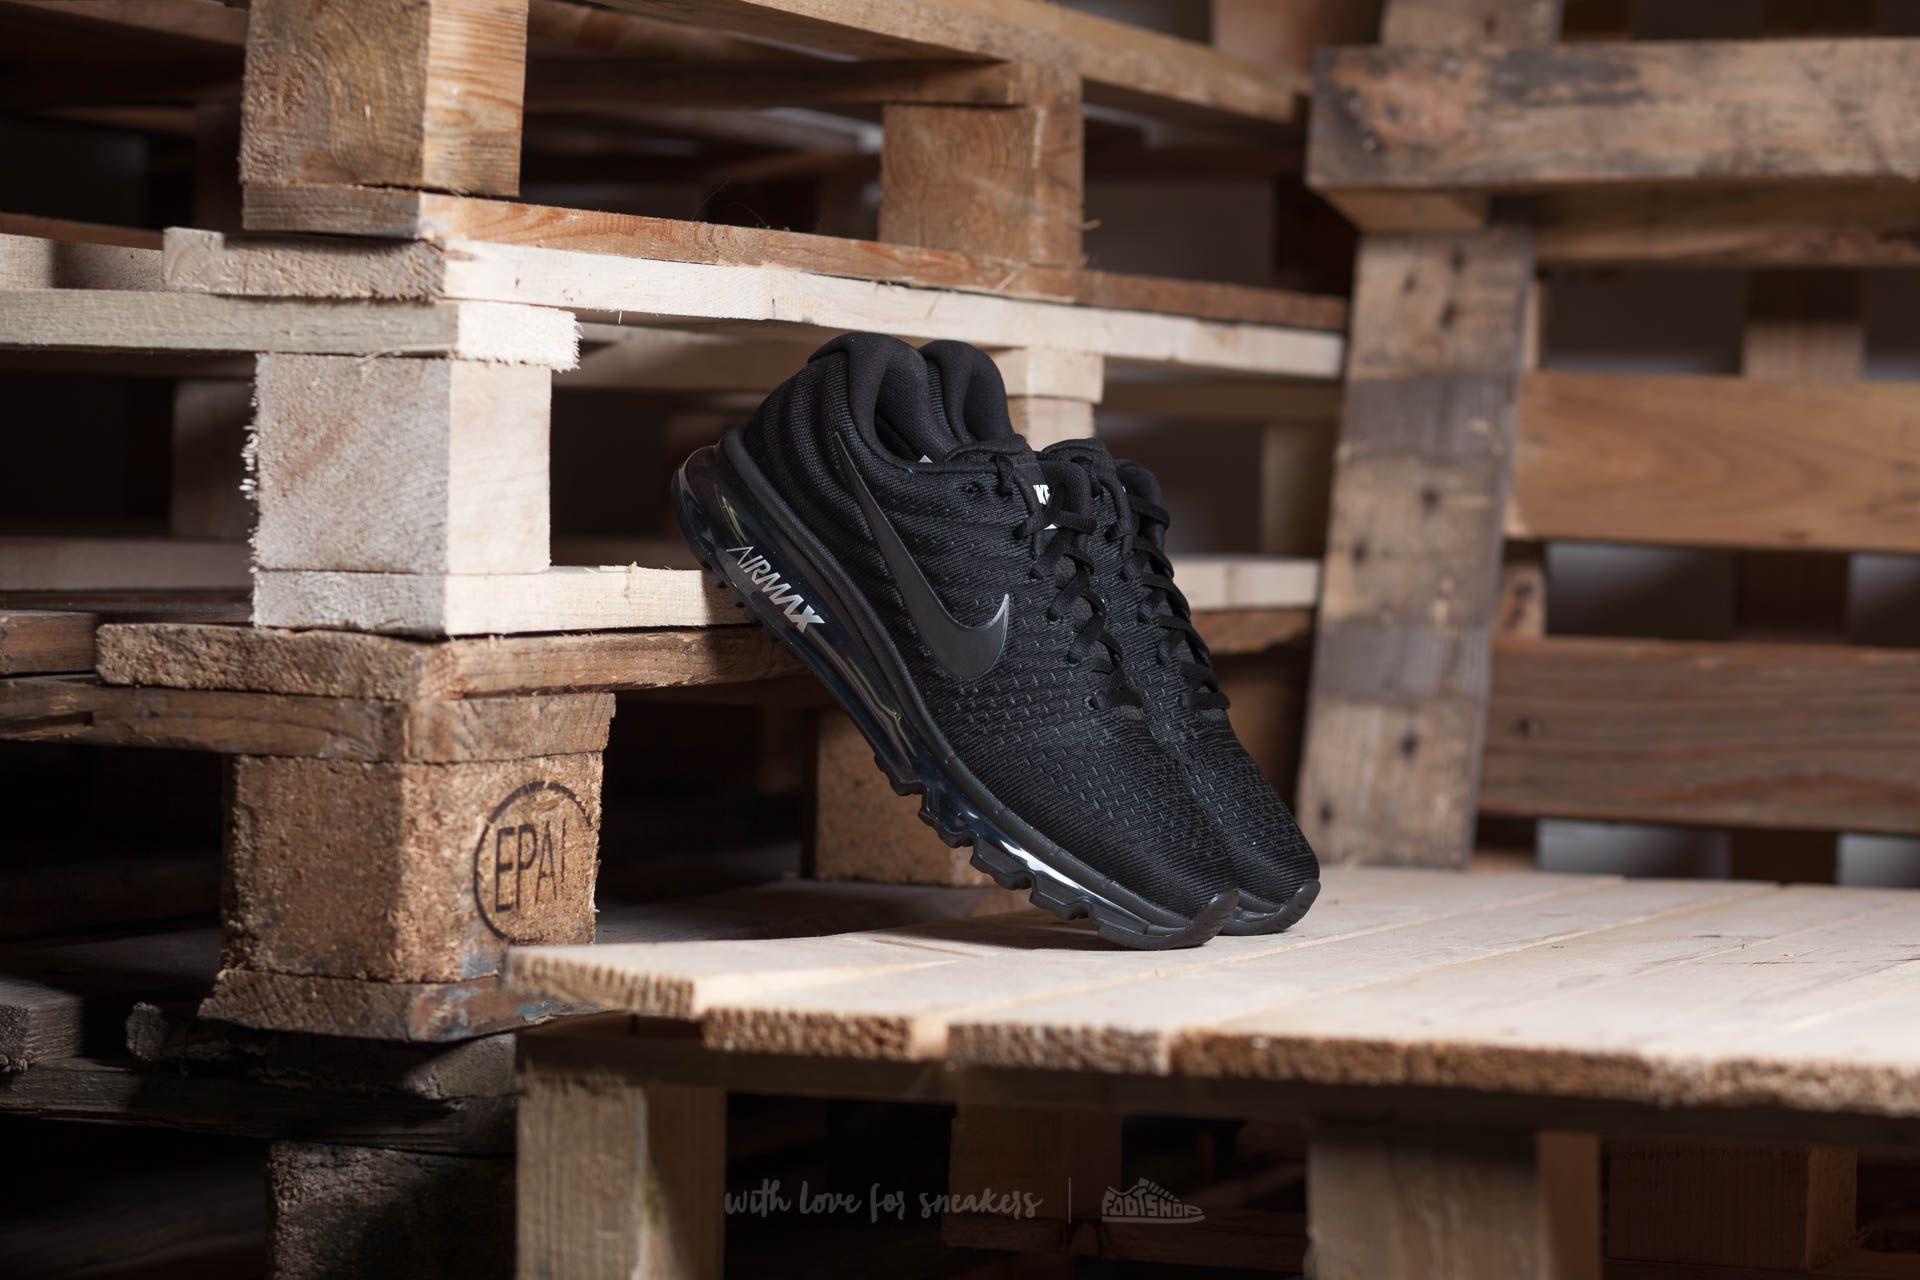 9dd325c31db Nike Wmns Air Max 2017 Black  Black  Black at a great price 191 €